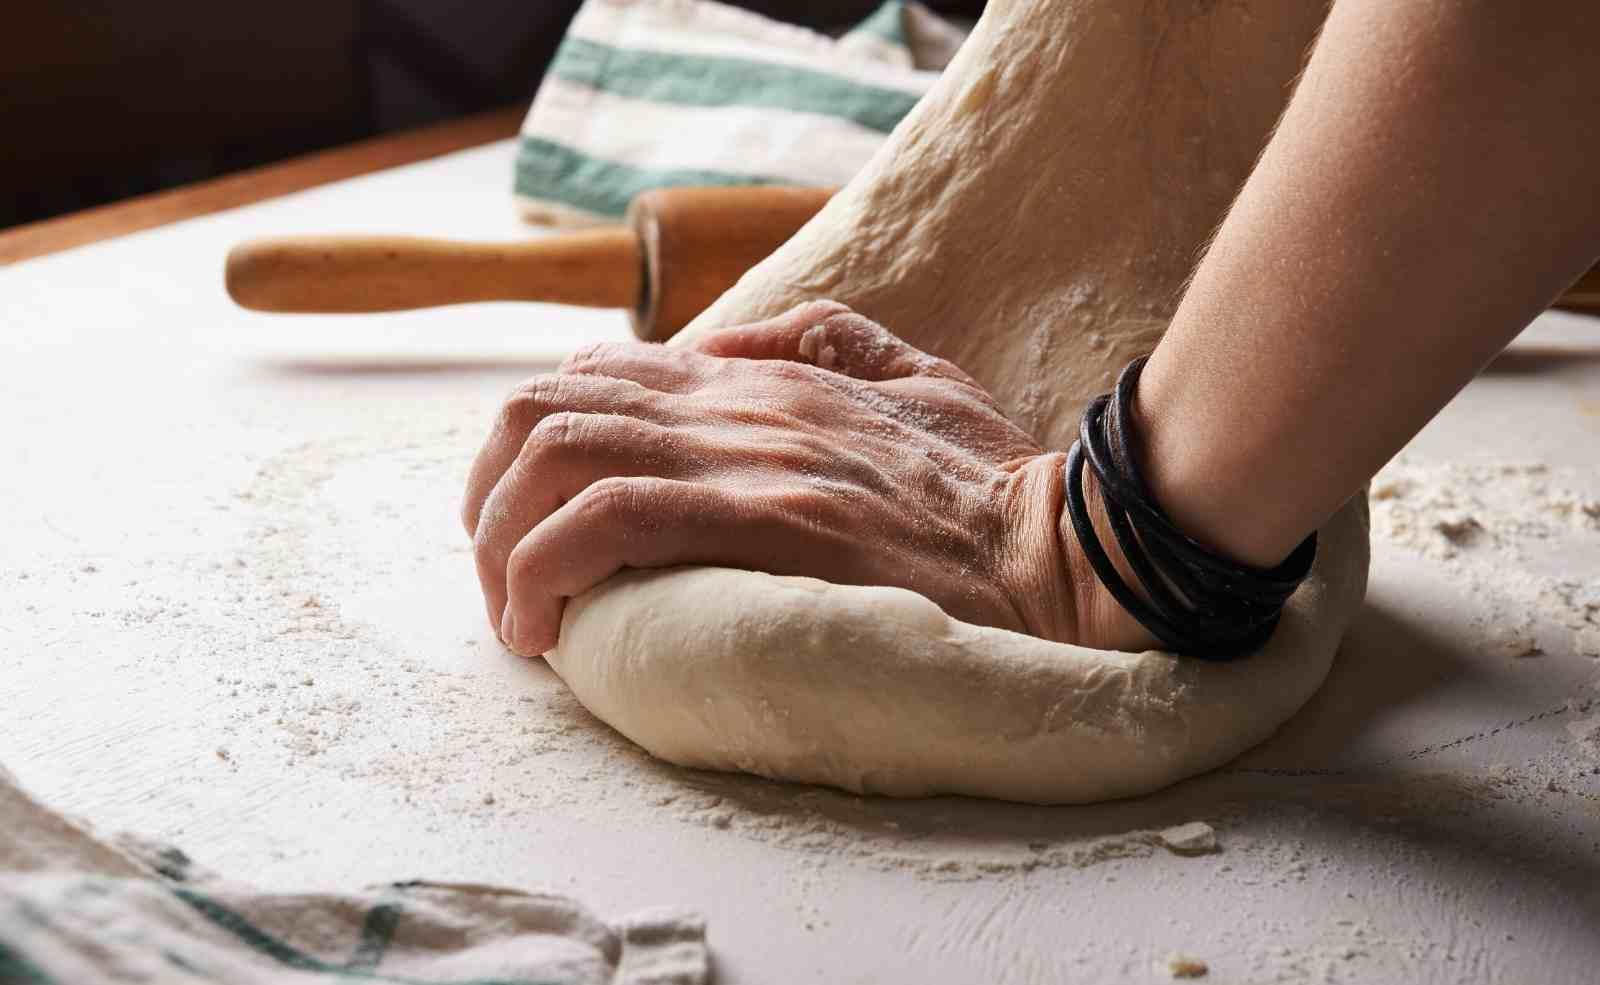 Brot backen ohne Hefe